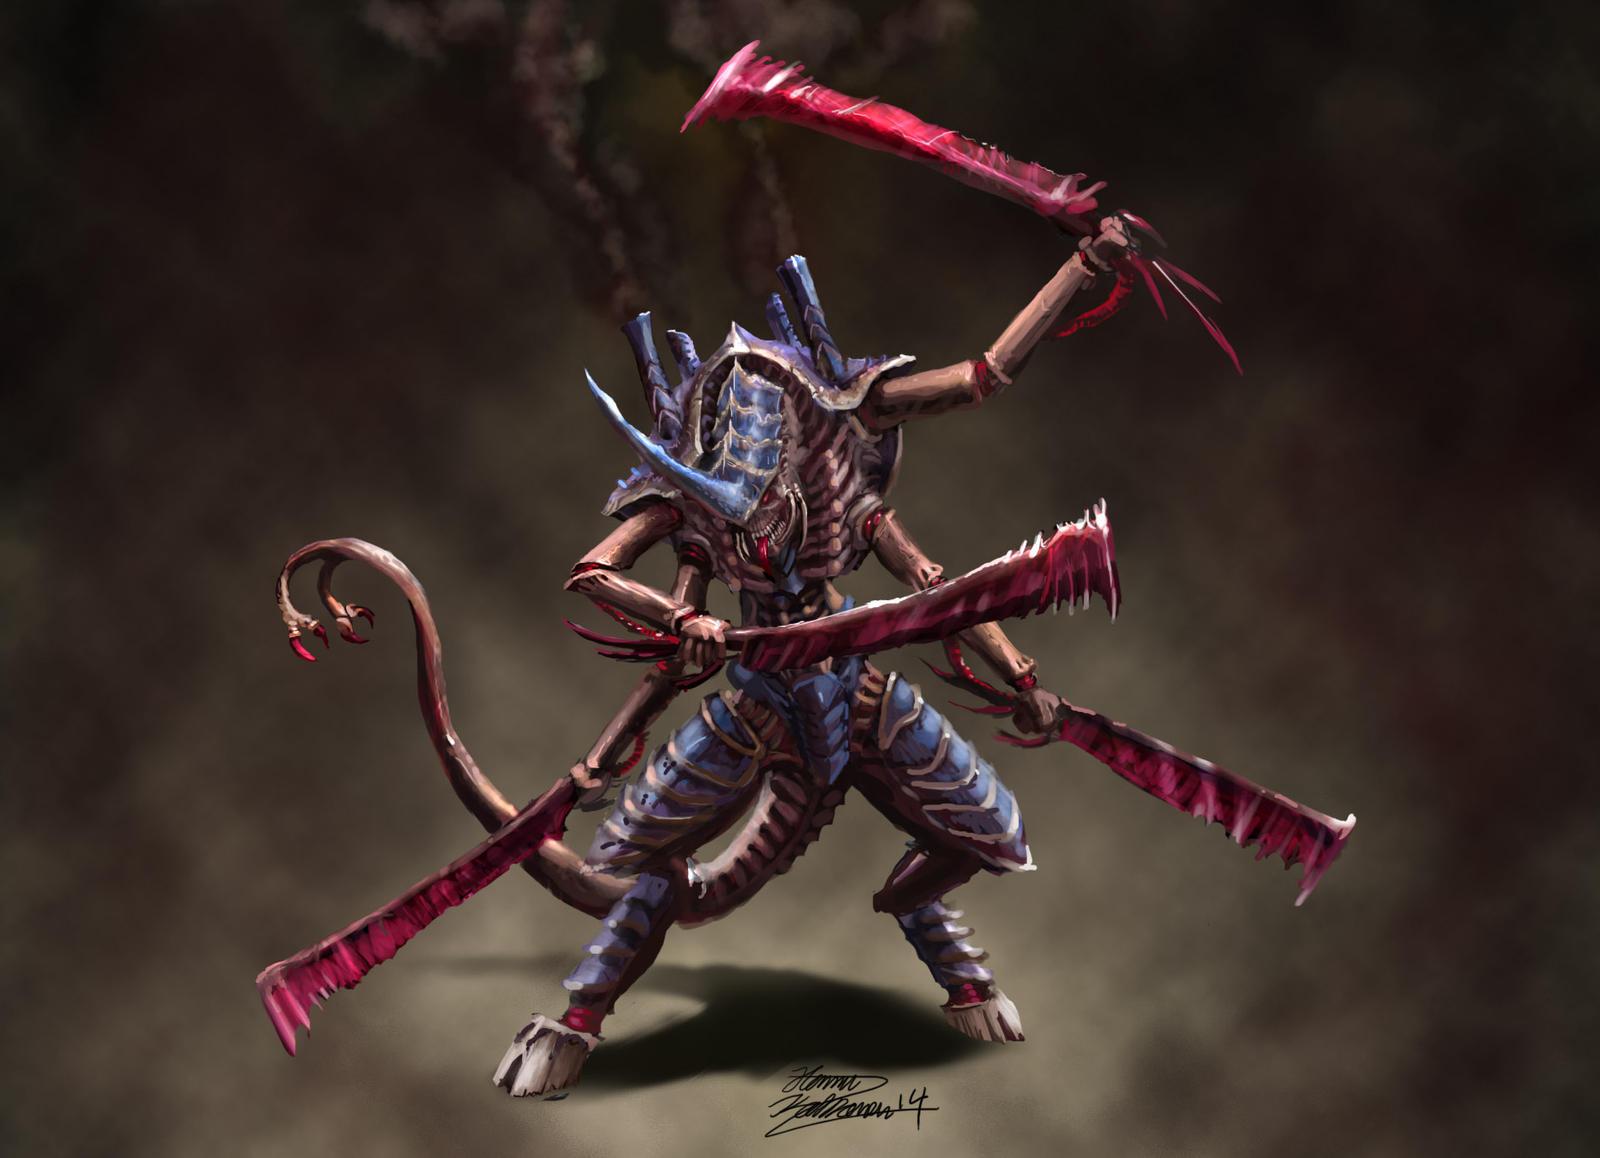 Warhammer 40k Hive Tyrant By Yorikasudon Deviantart – Fondos de Pantalla